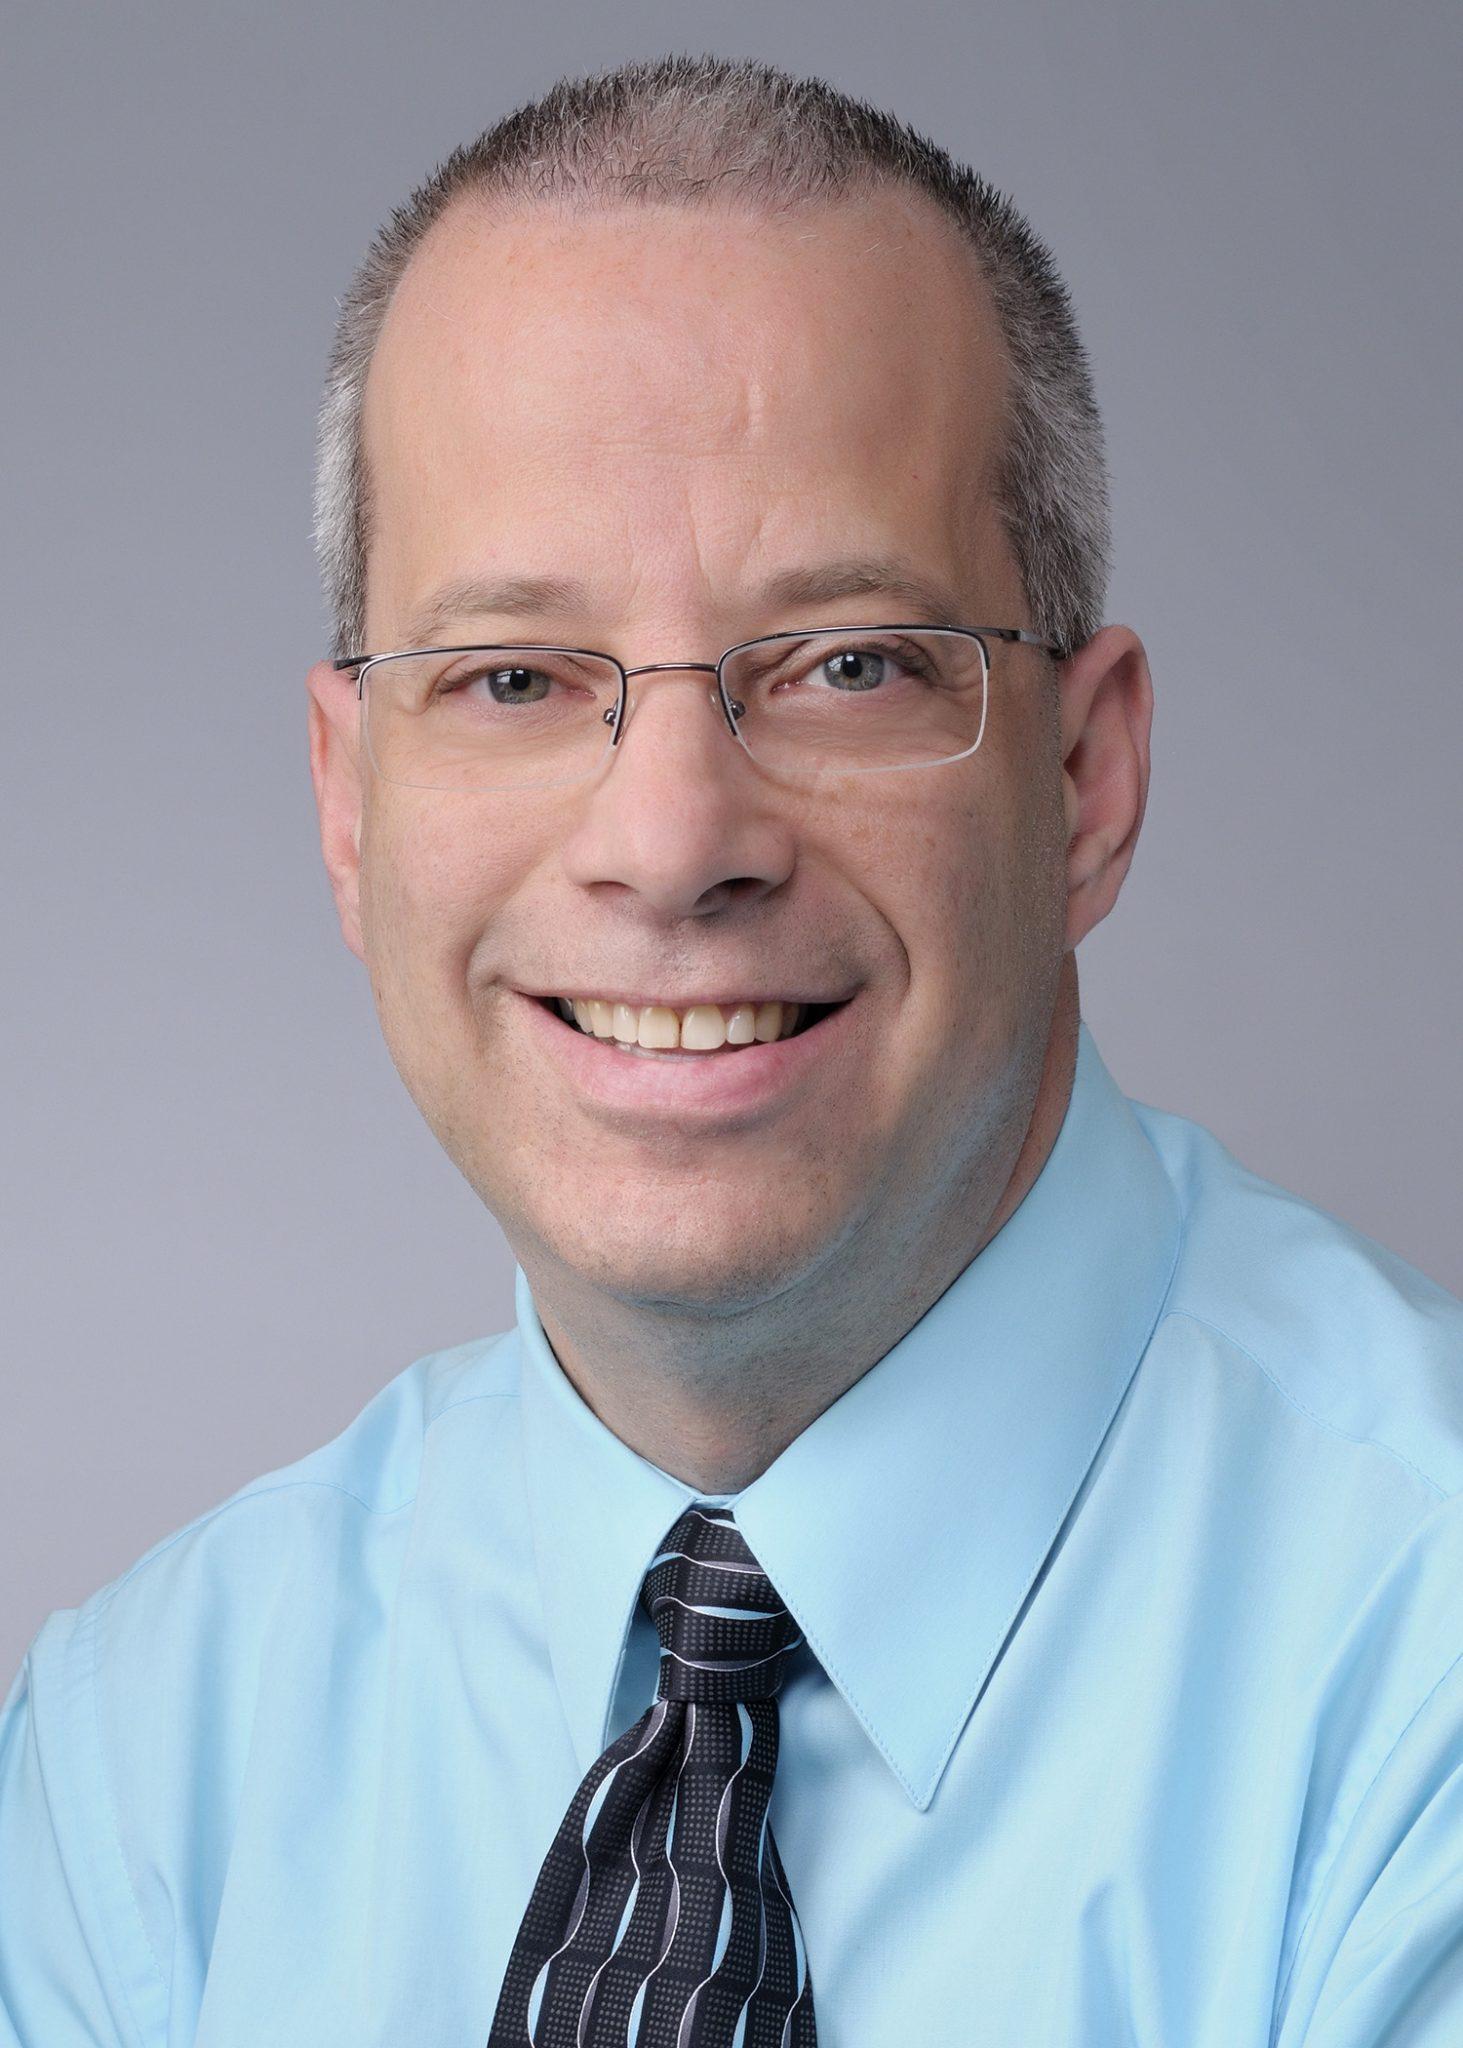 David Dolgoruck - Office Manager - Kainen, Escalera & McHale